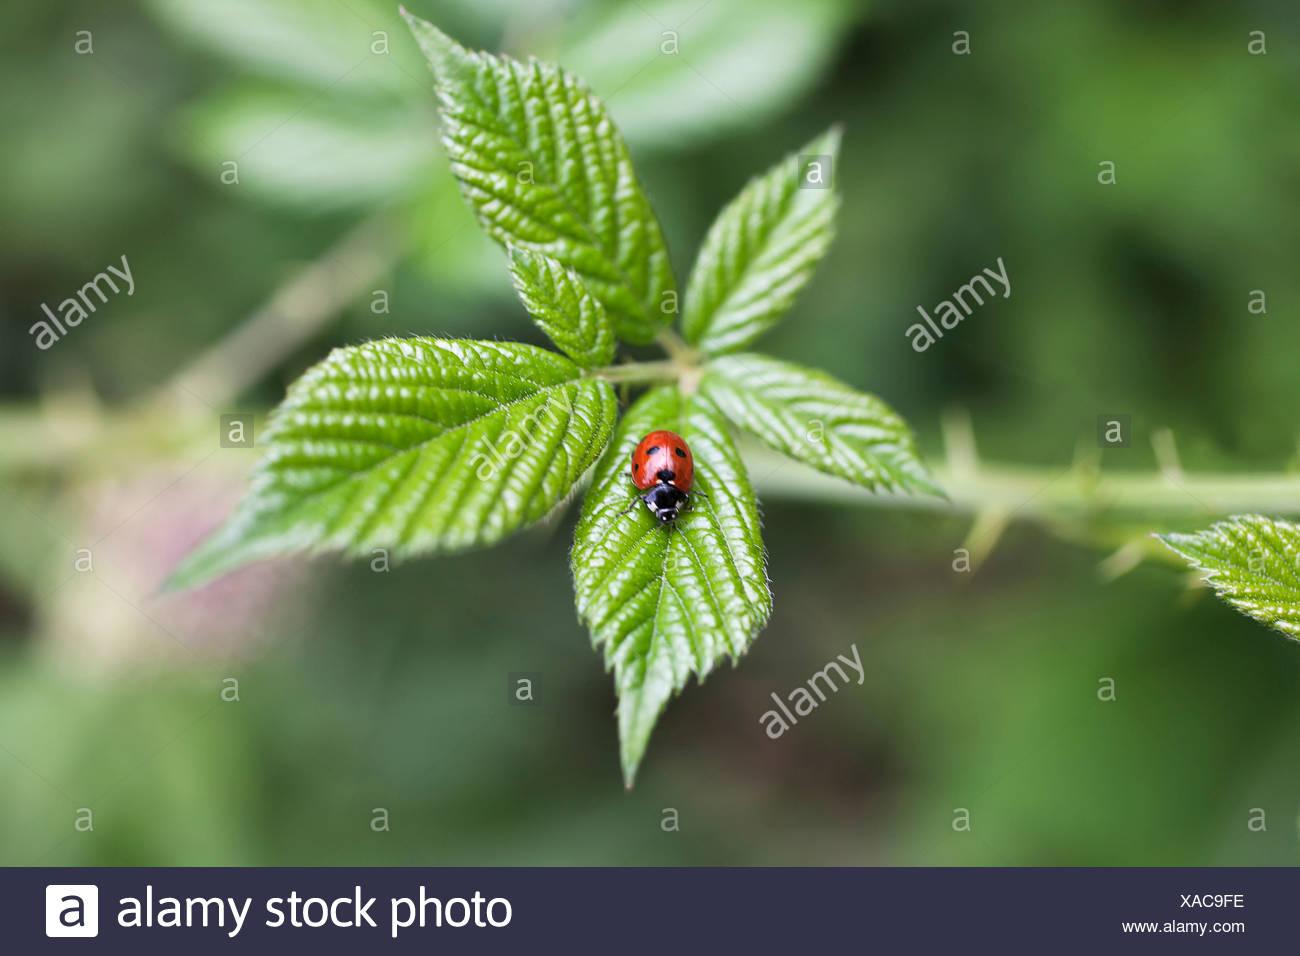 Rubus Fruticosus, Blackberry, Wild, grün, grün. Stockfoto